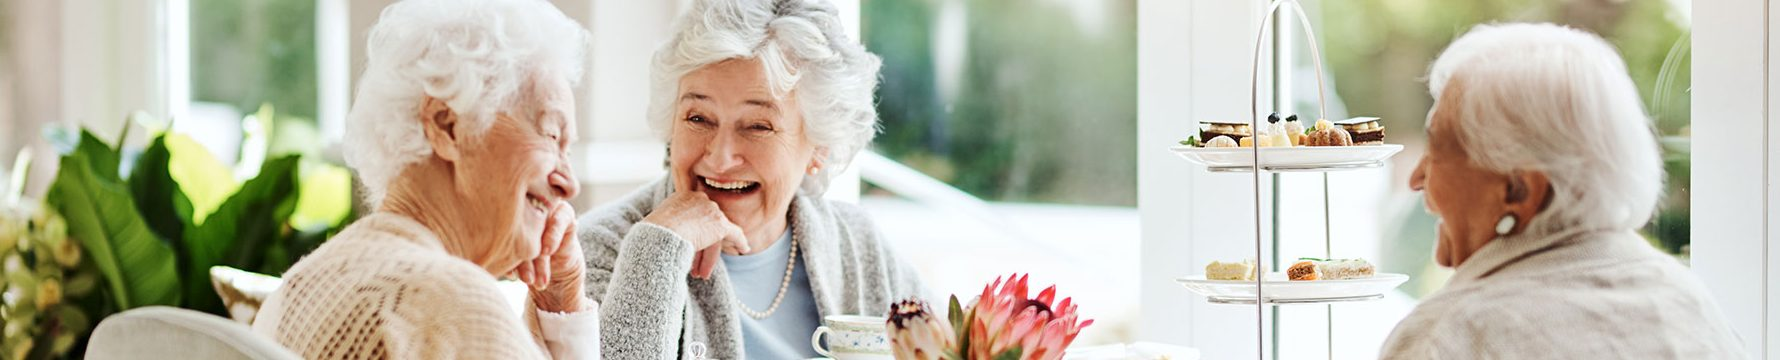 Three elderly women laughing while enjoying tea and pastries